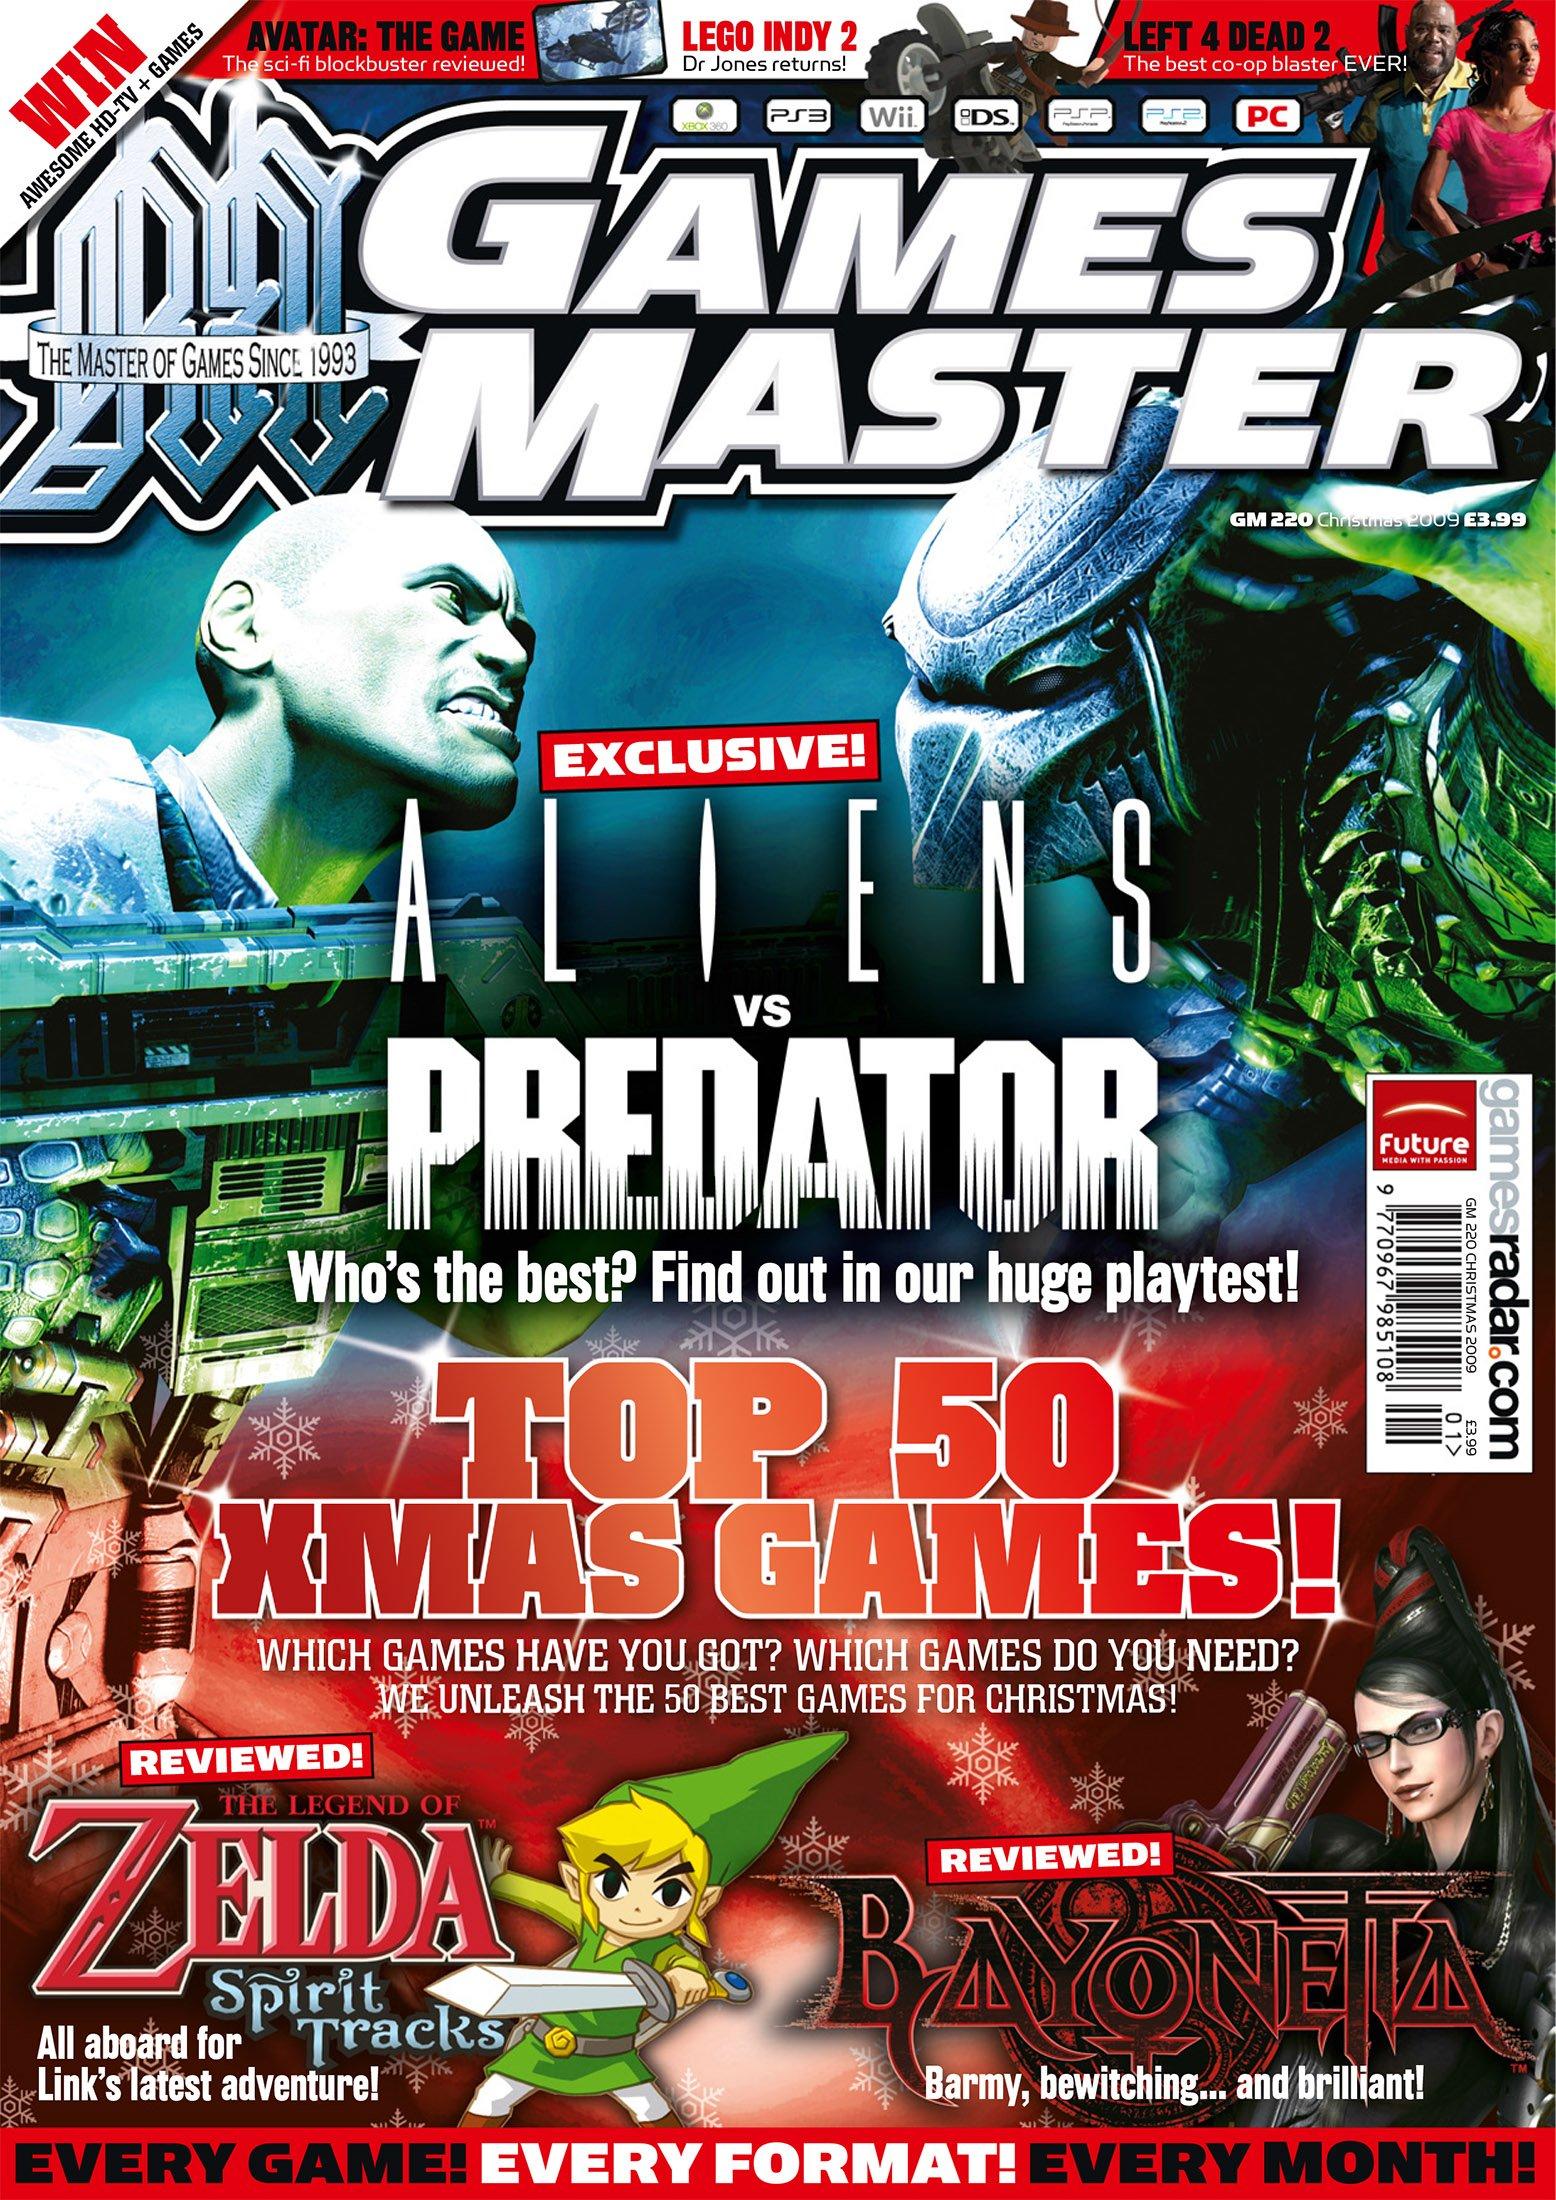 GamesMaster Issue 220 (January 2010)